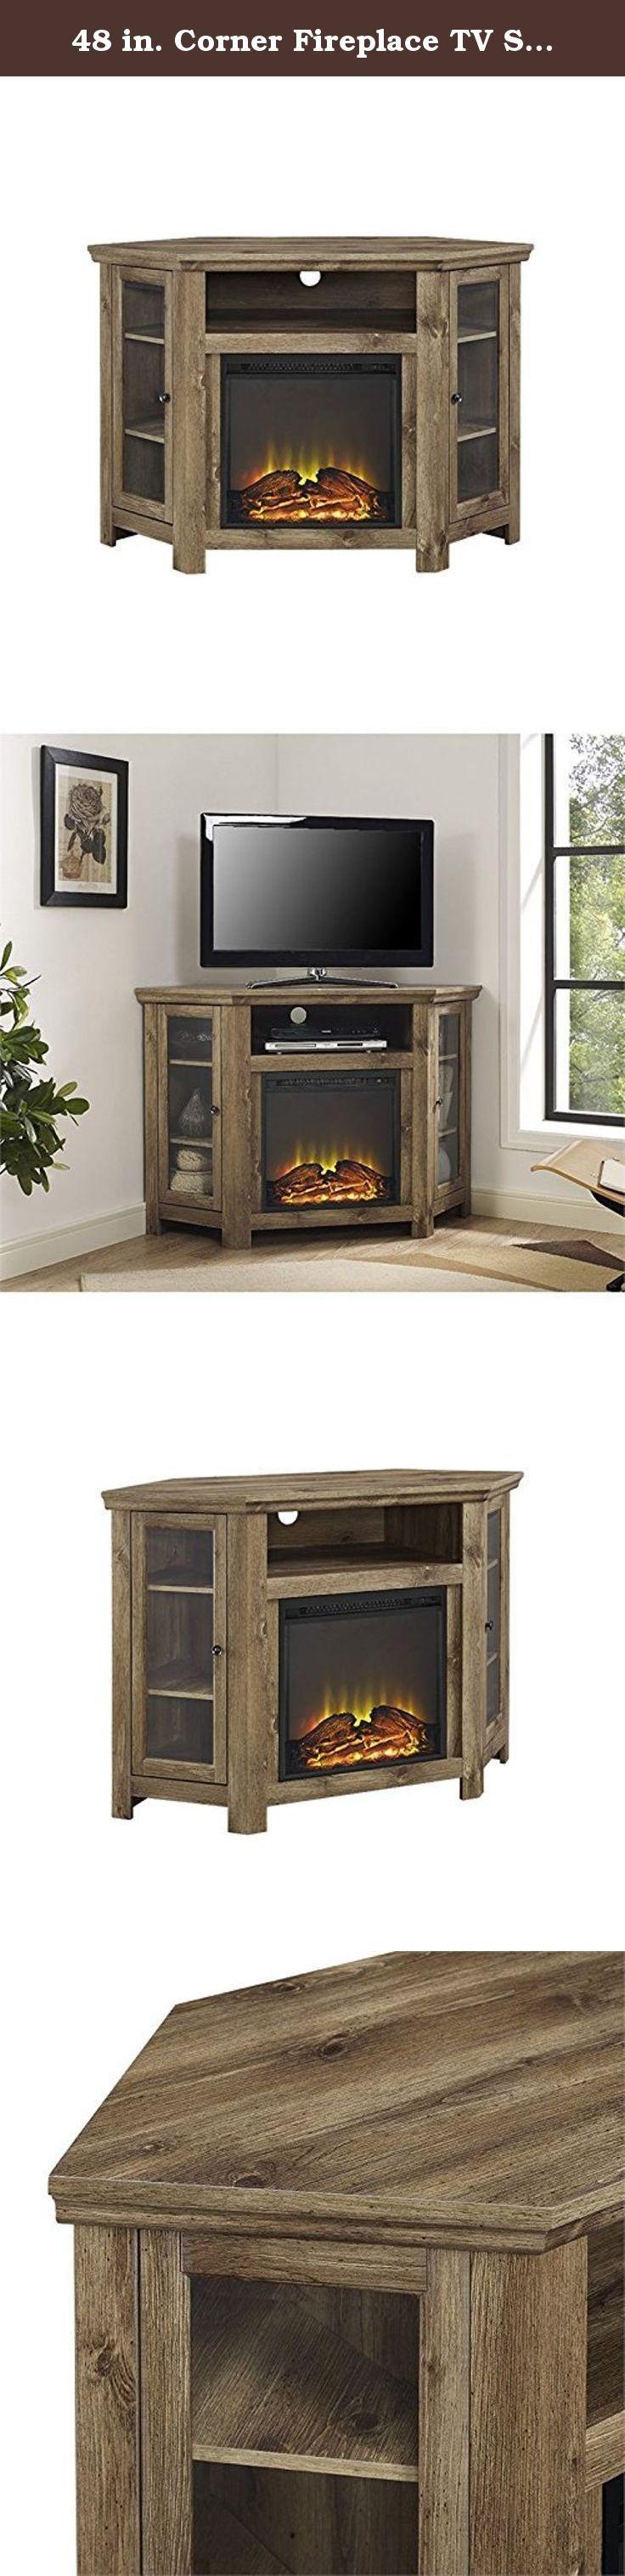 16b89c4dd69edb73928d595bd5e9dde3  corner fireplace tv stand corner fireplaces Top Result 50 Awesome Corner Electric Fireplace Pic 2018 Jdt4